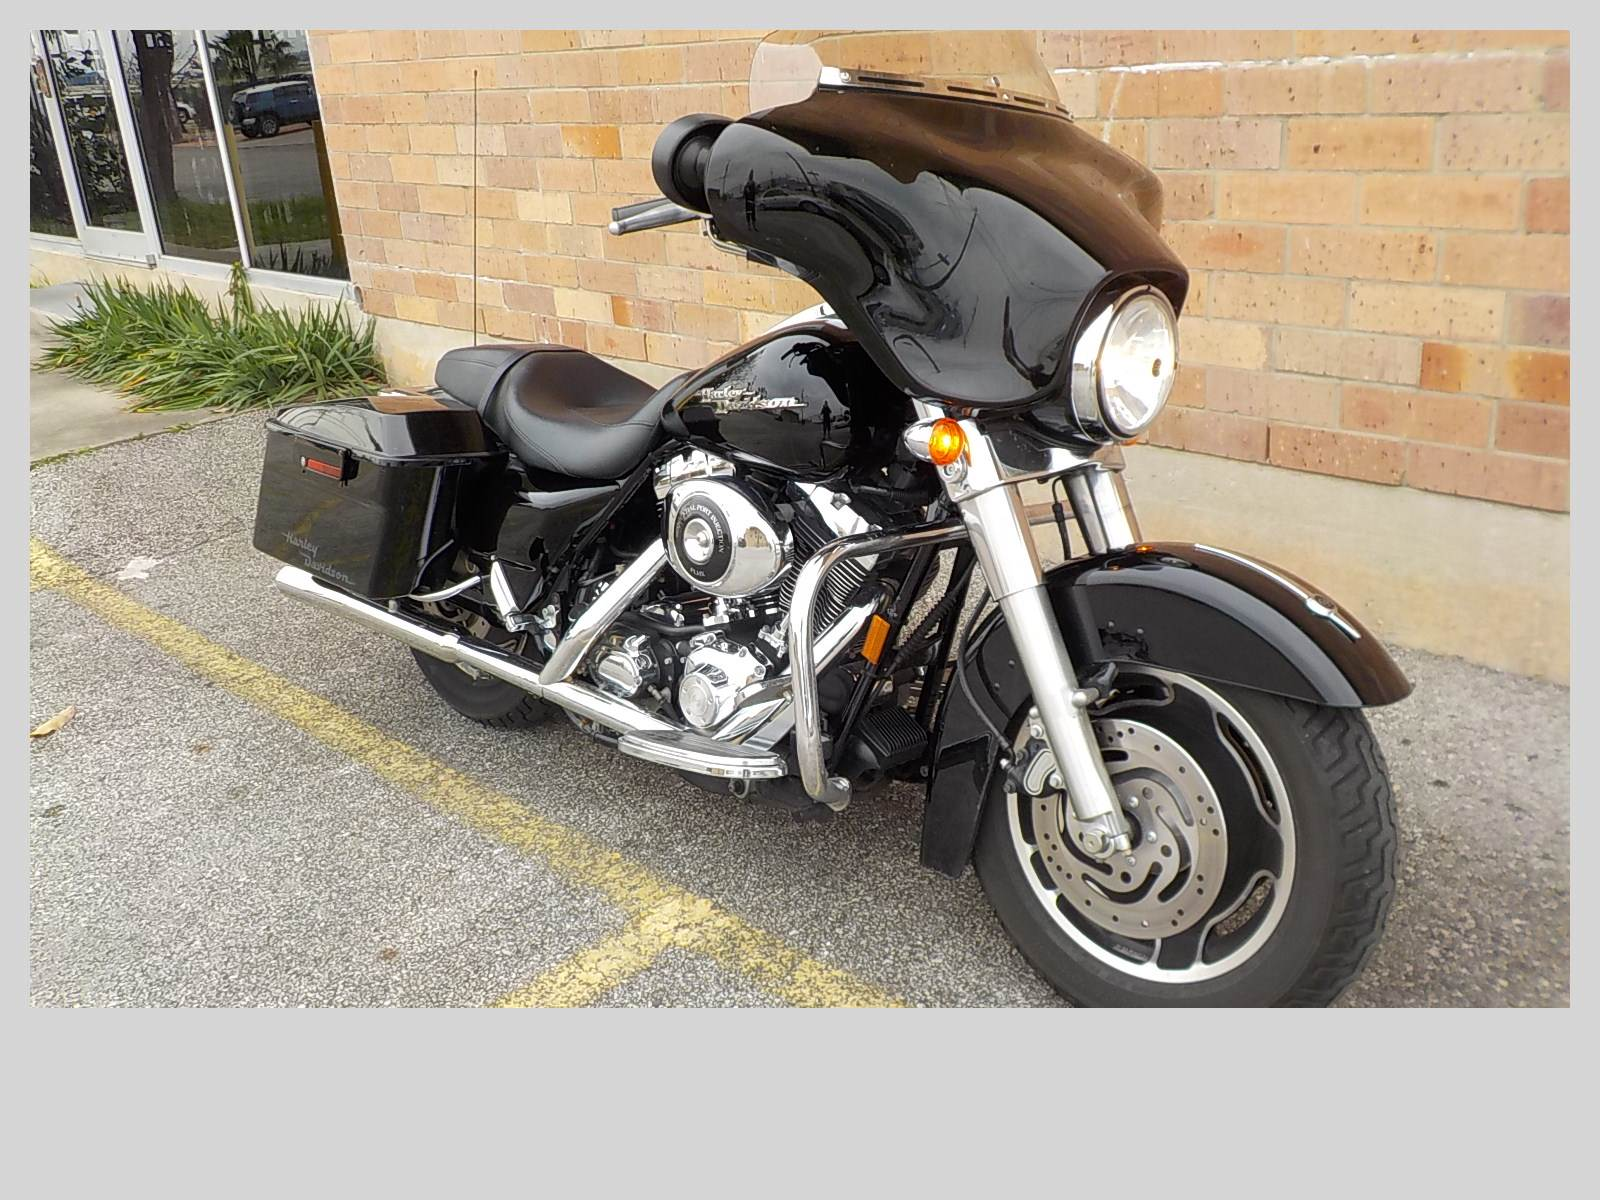 2006 Harley-Davidson Street Glide 3